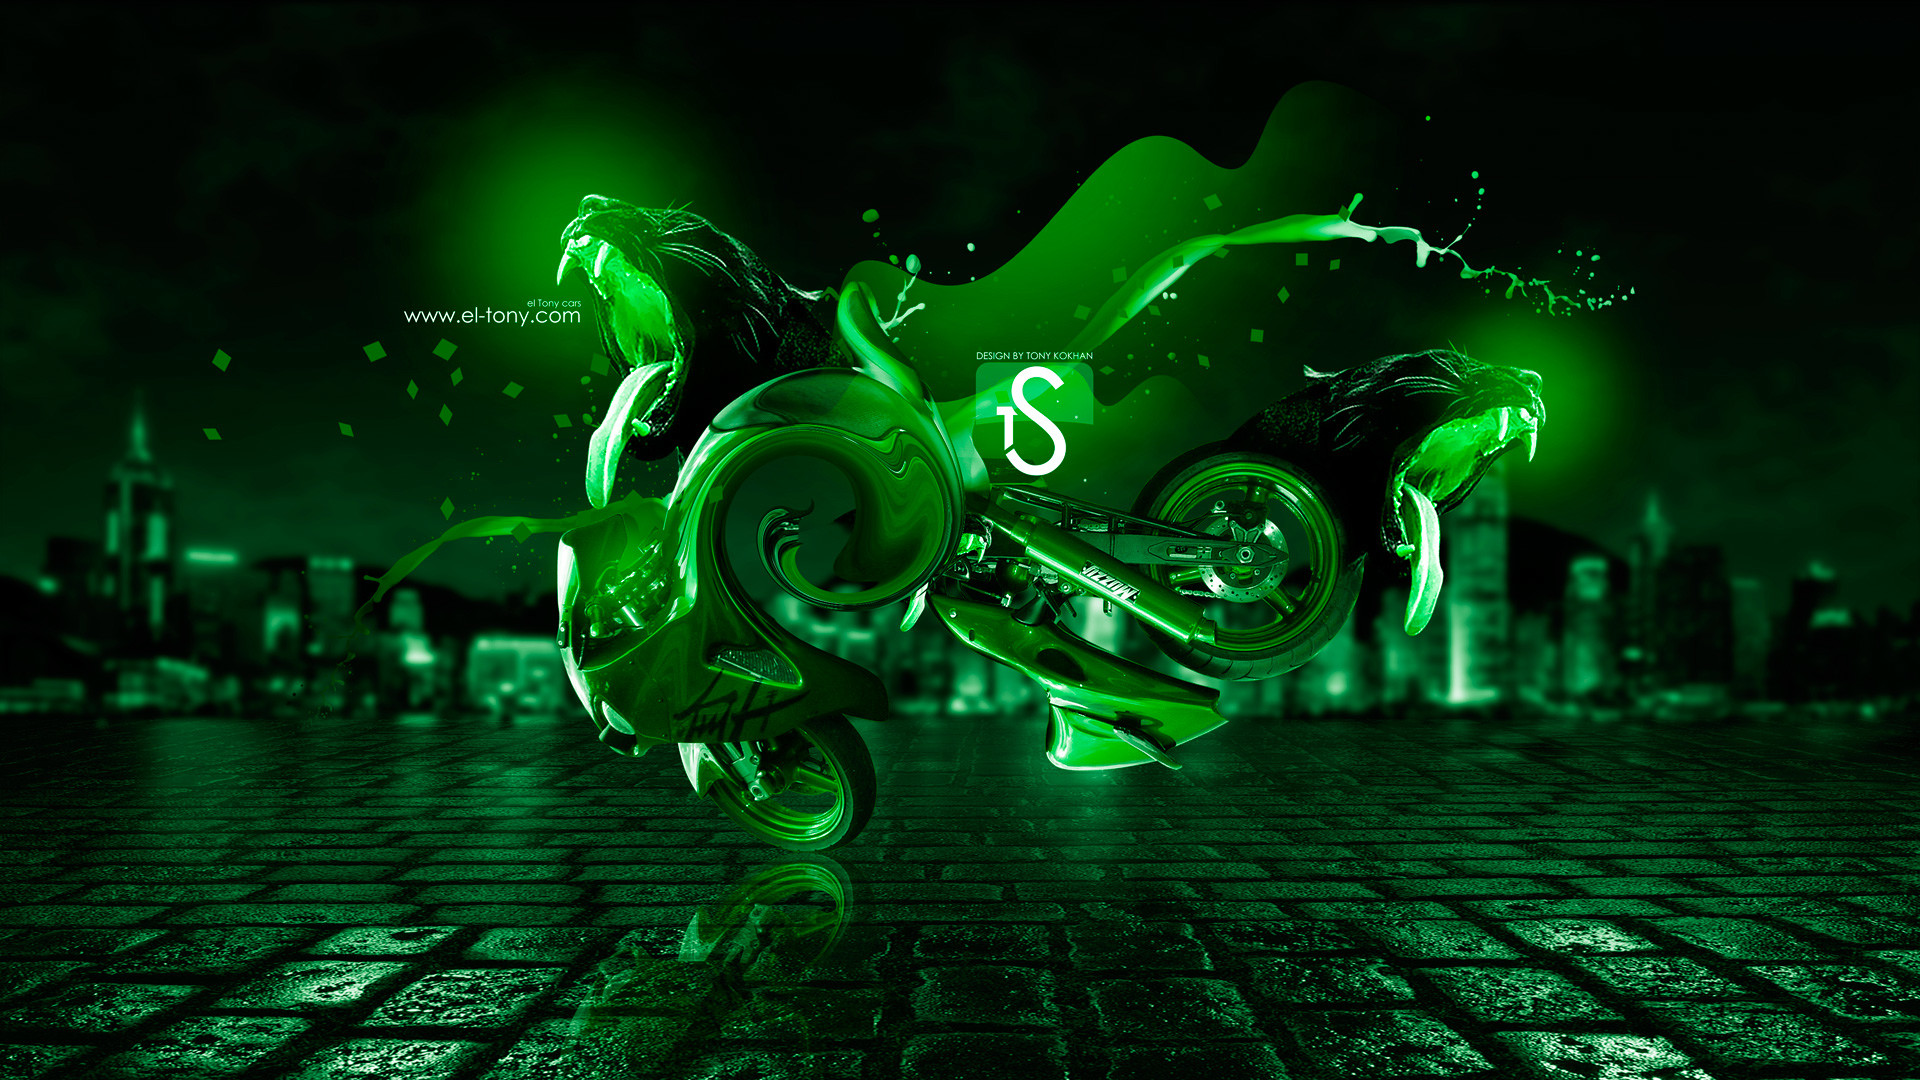 Neon Green Wallpapers ·â' WallpaperTag